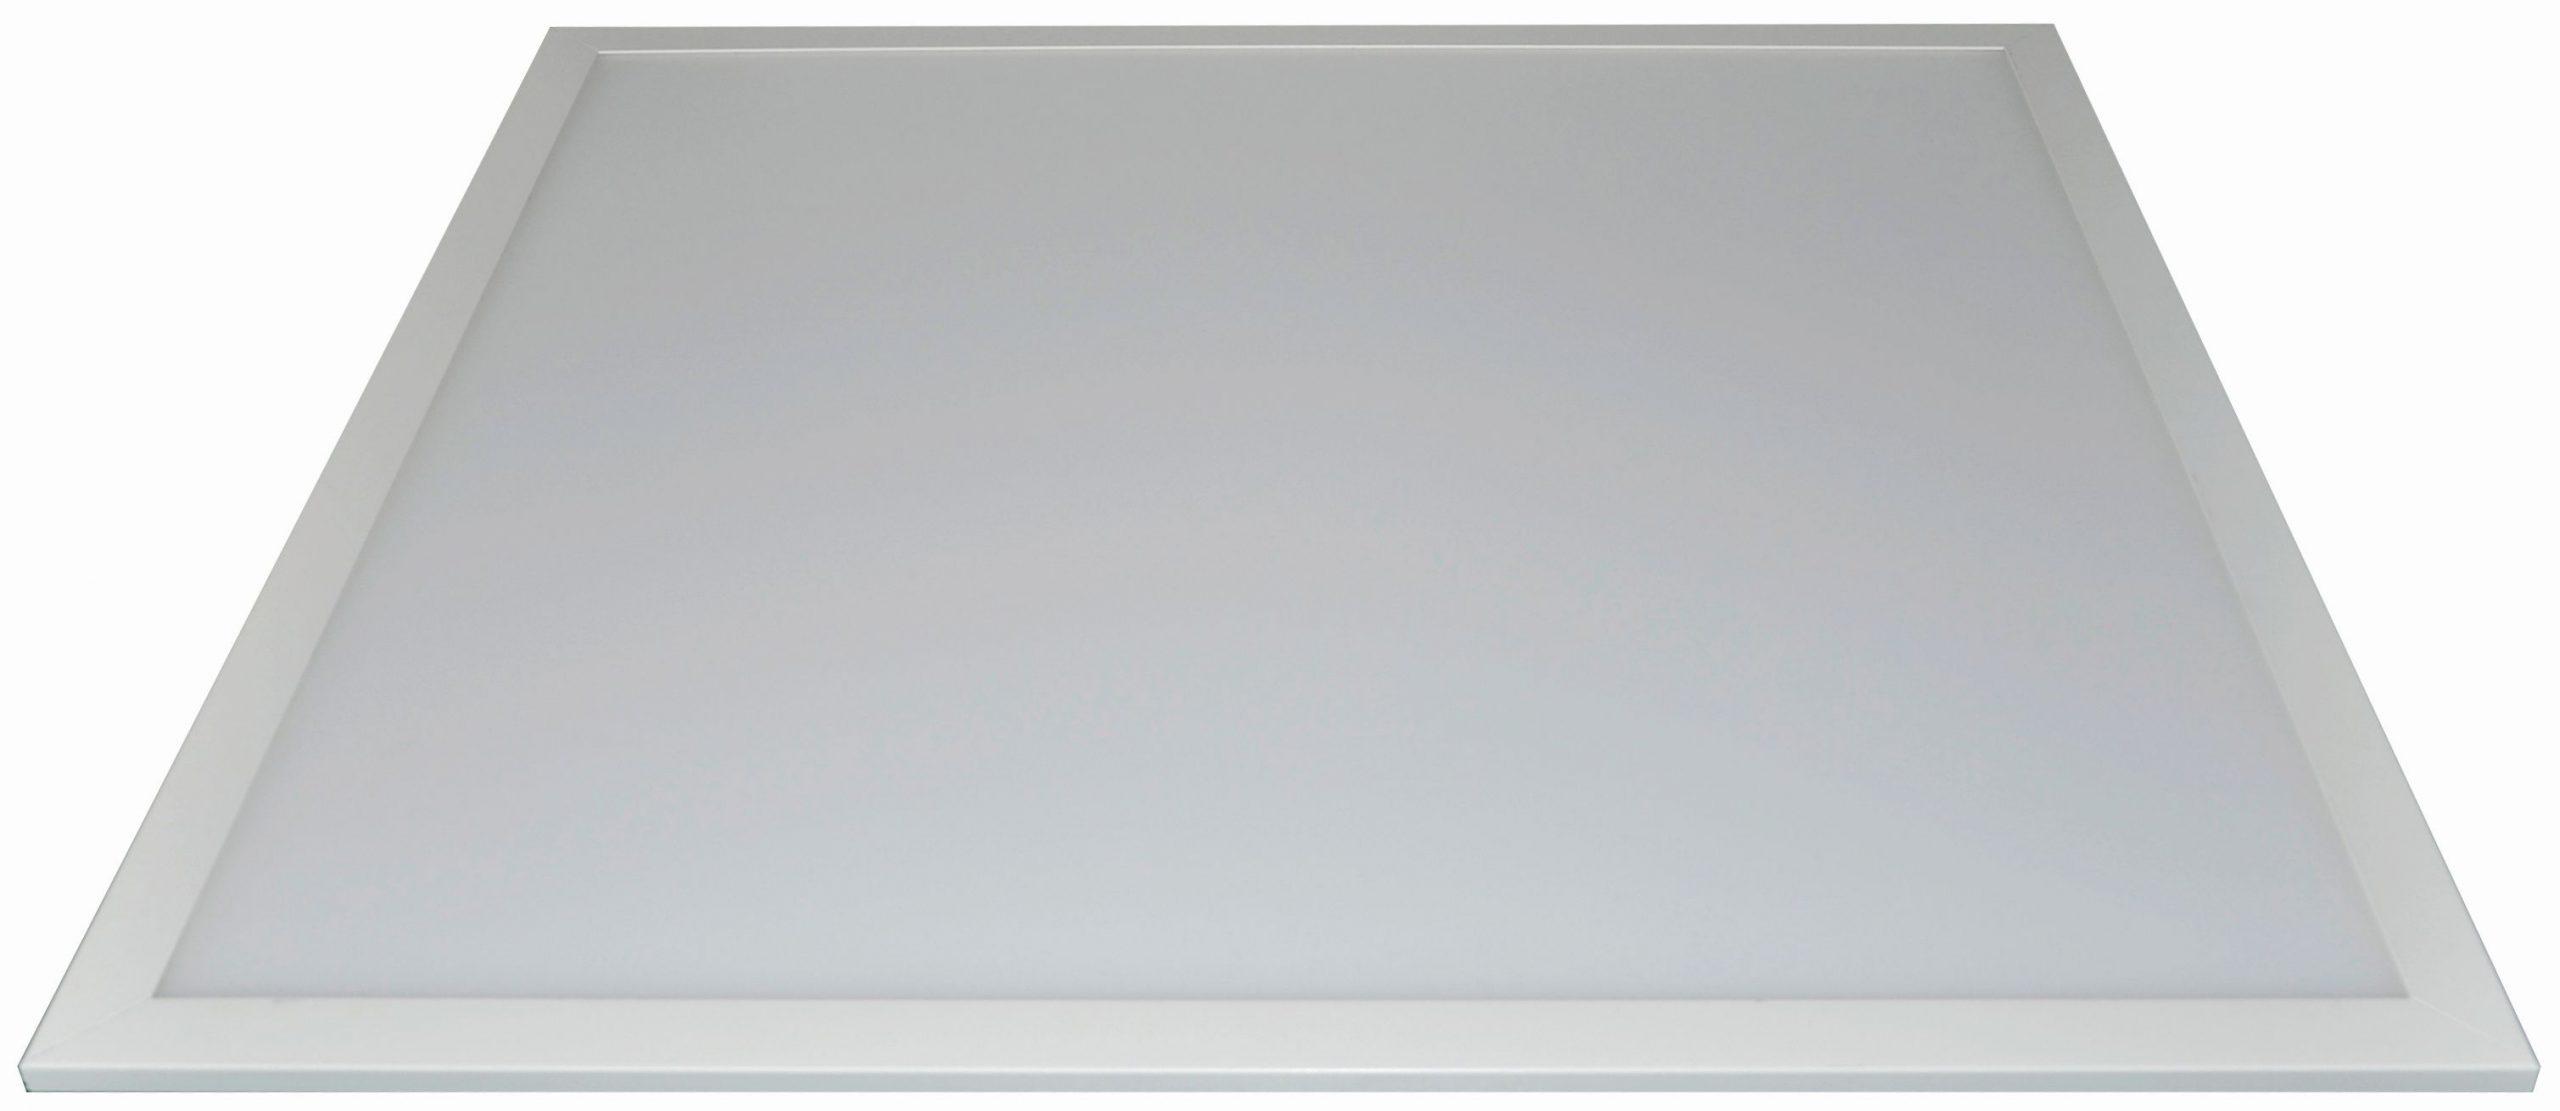 LED Panel Einlegeleuchte Modul-625 IP65 – Ausführung: UGR